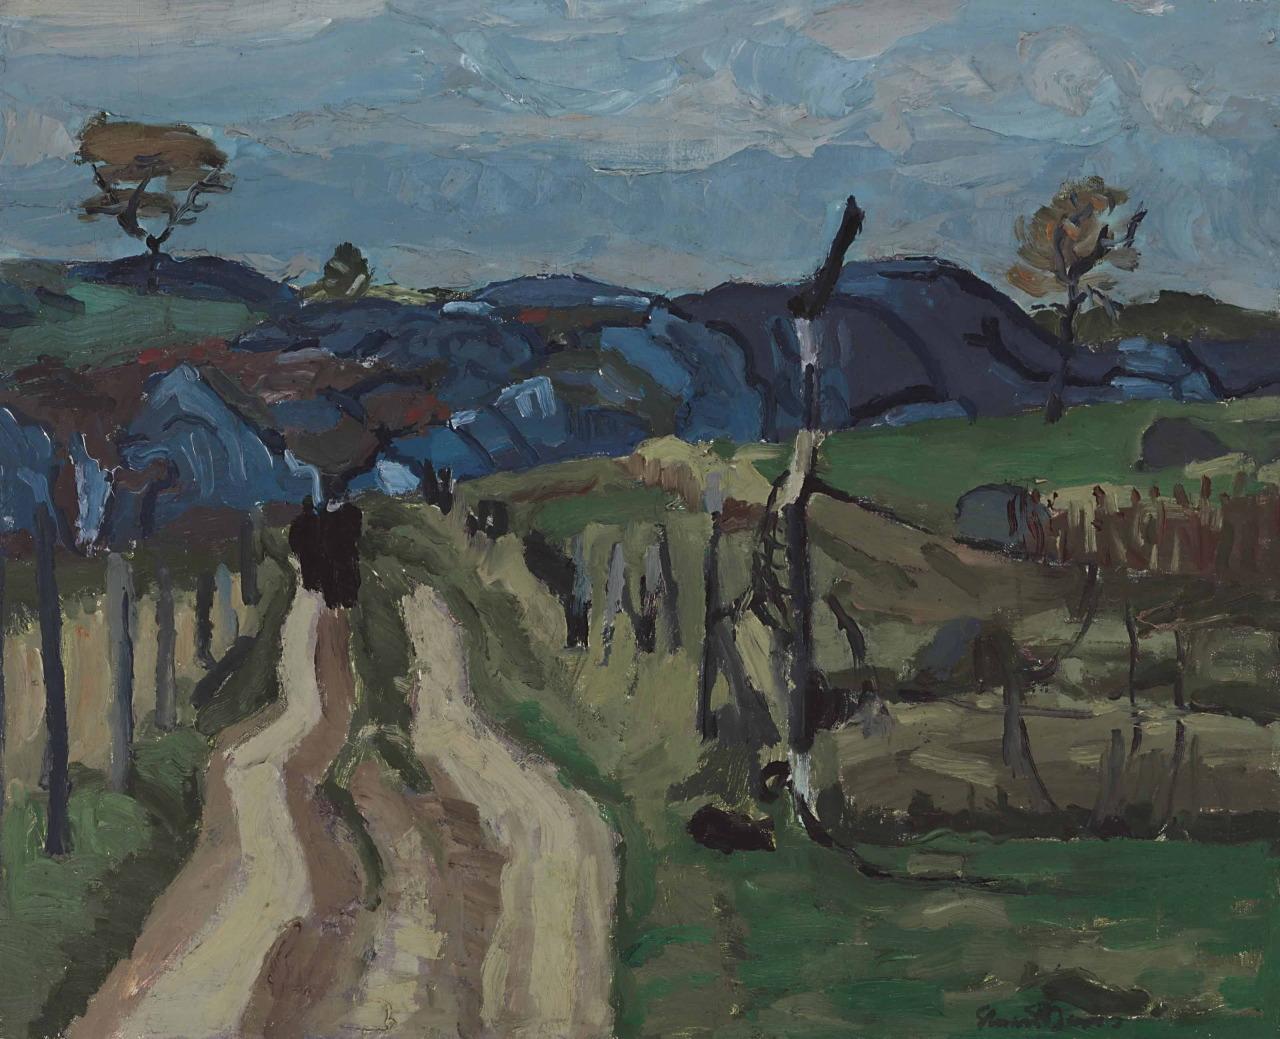 lawrenceleemagnuson:Stuart Davis (USA 1892-1964)Landscape Blue (1919)oil on canvas 48.3 x 58.4cm